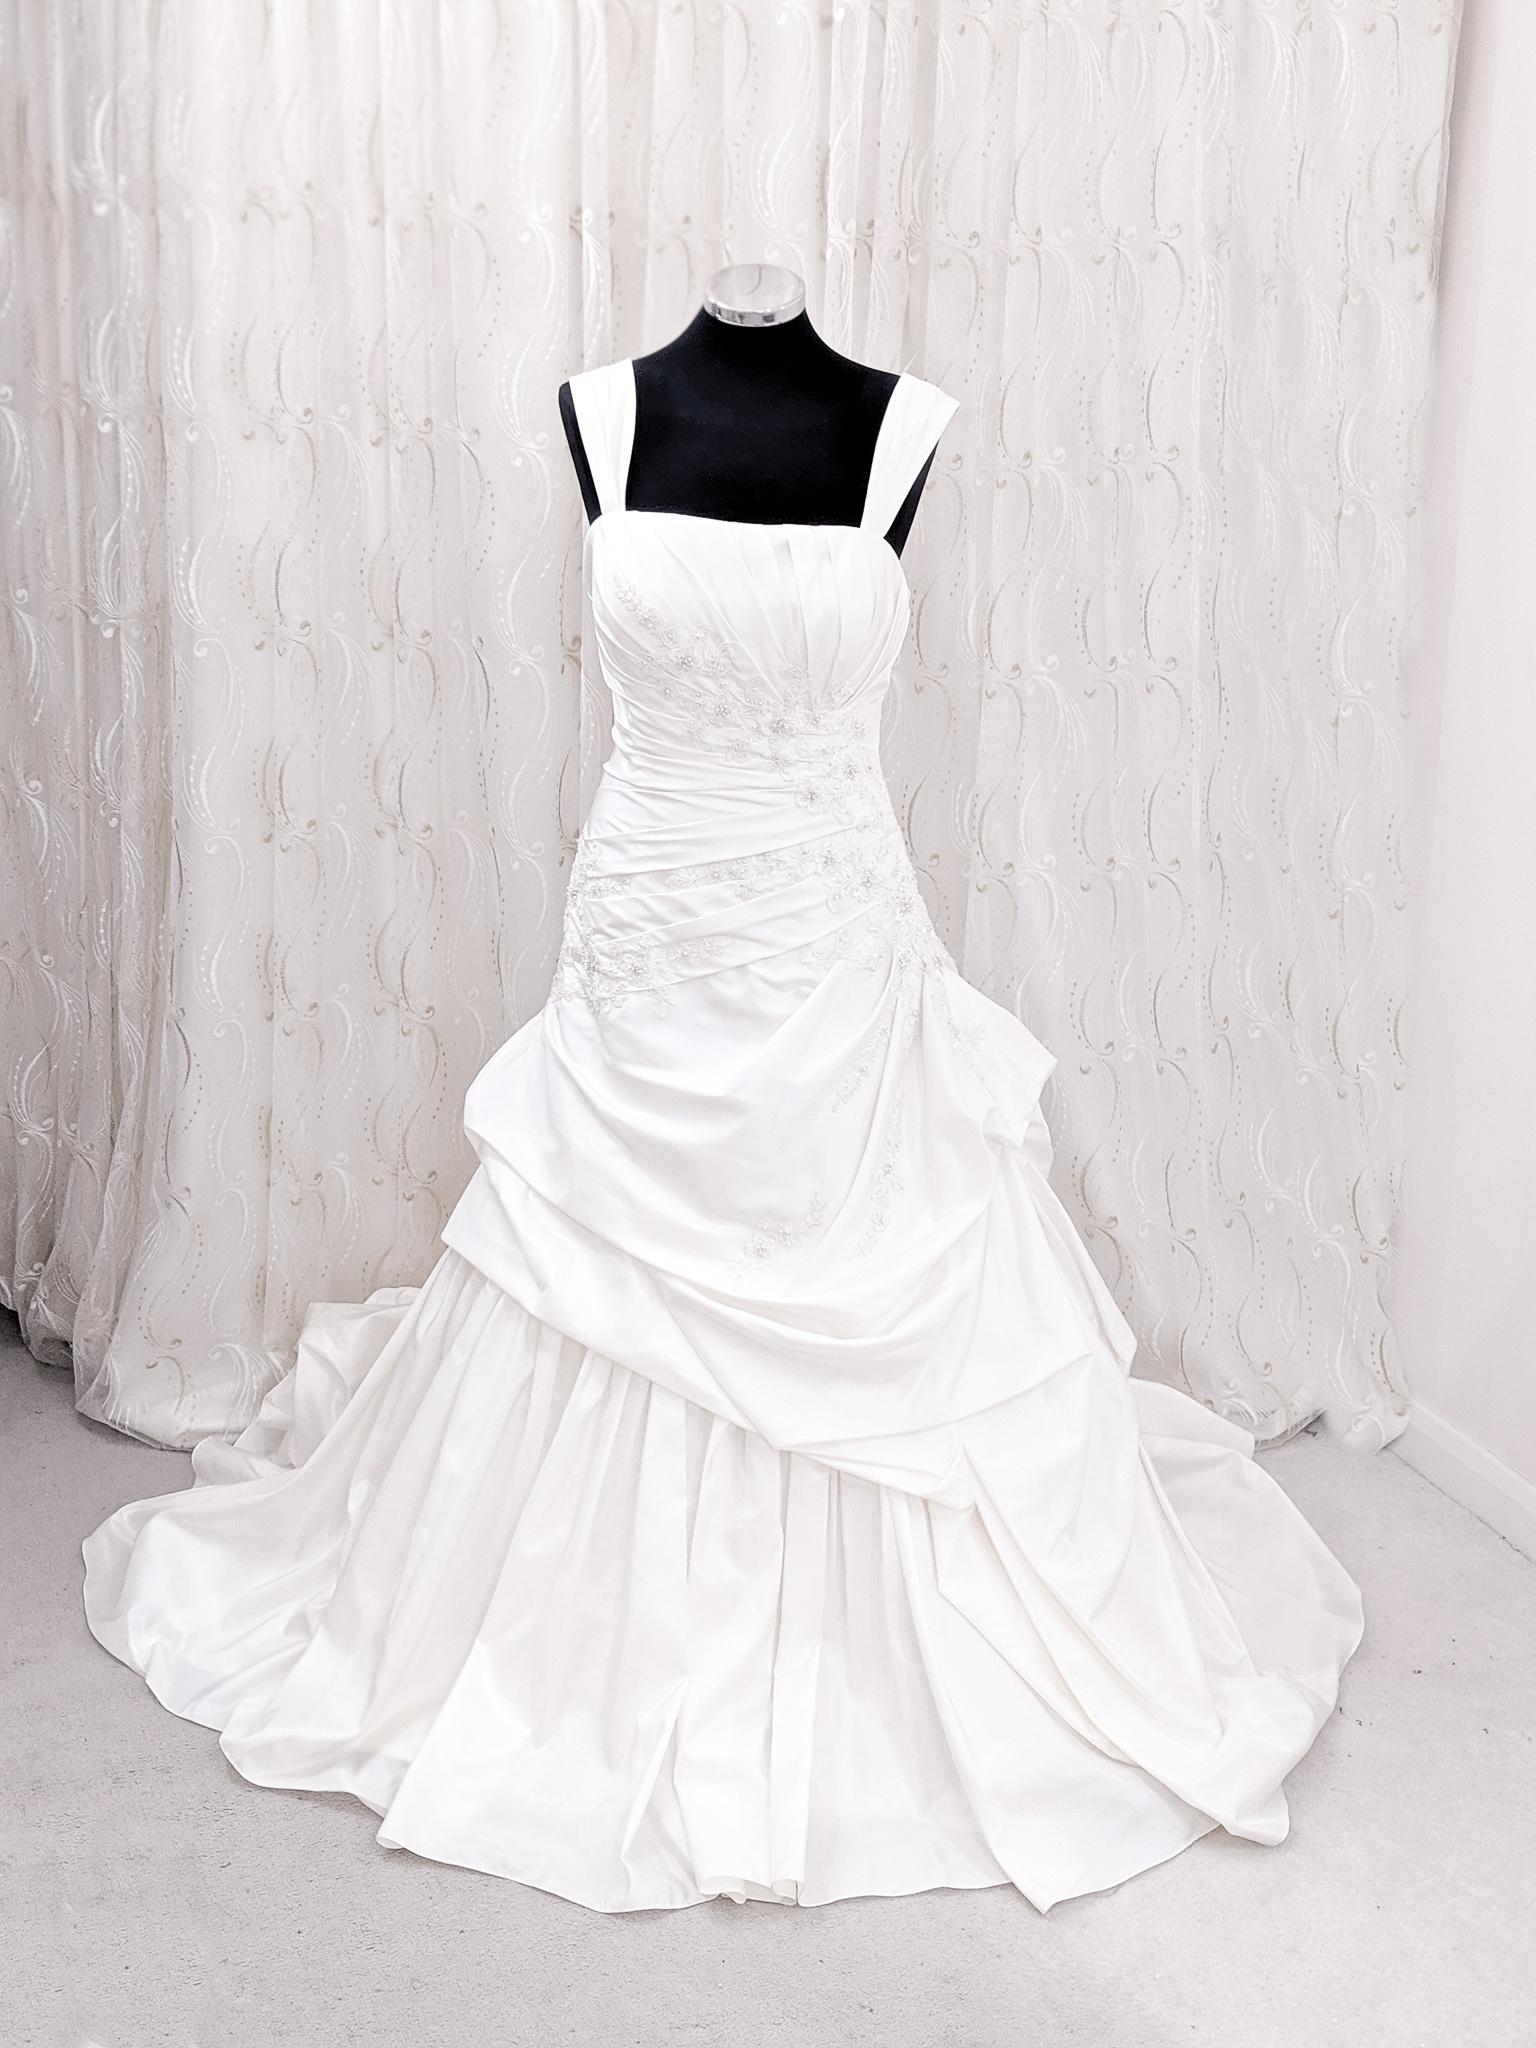 Pleated Bridal Ball Dress Lbb103 The London Bridal Boutique